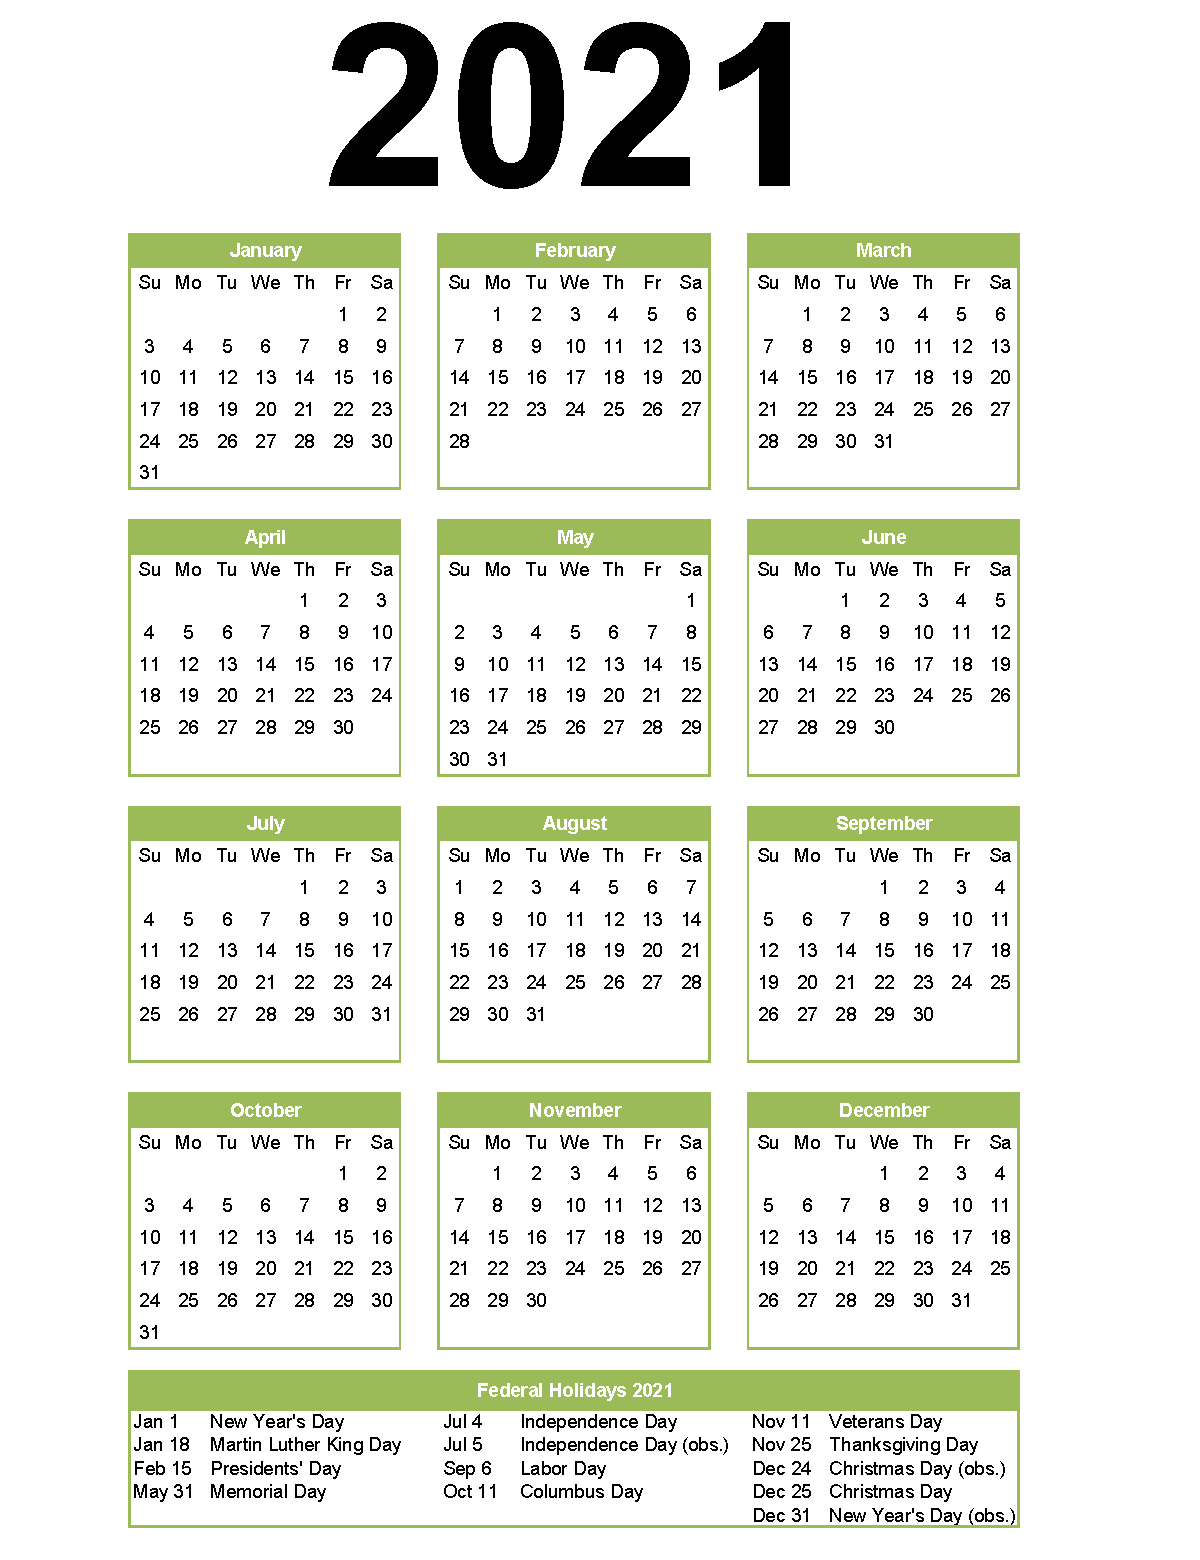 2021 Portrait Holidays Calendar in 2020 | 2021 calendar ...